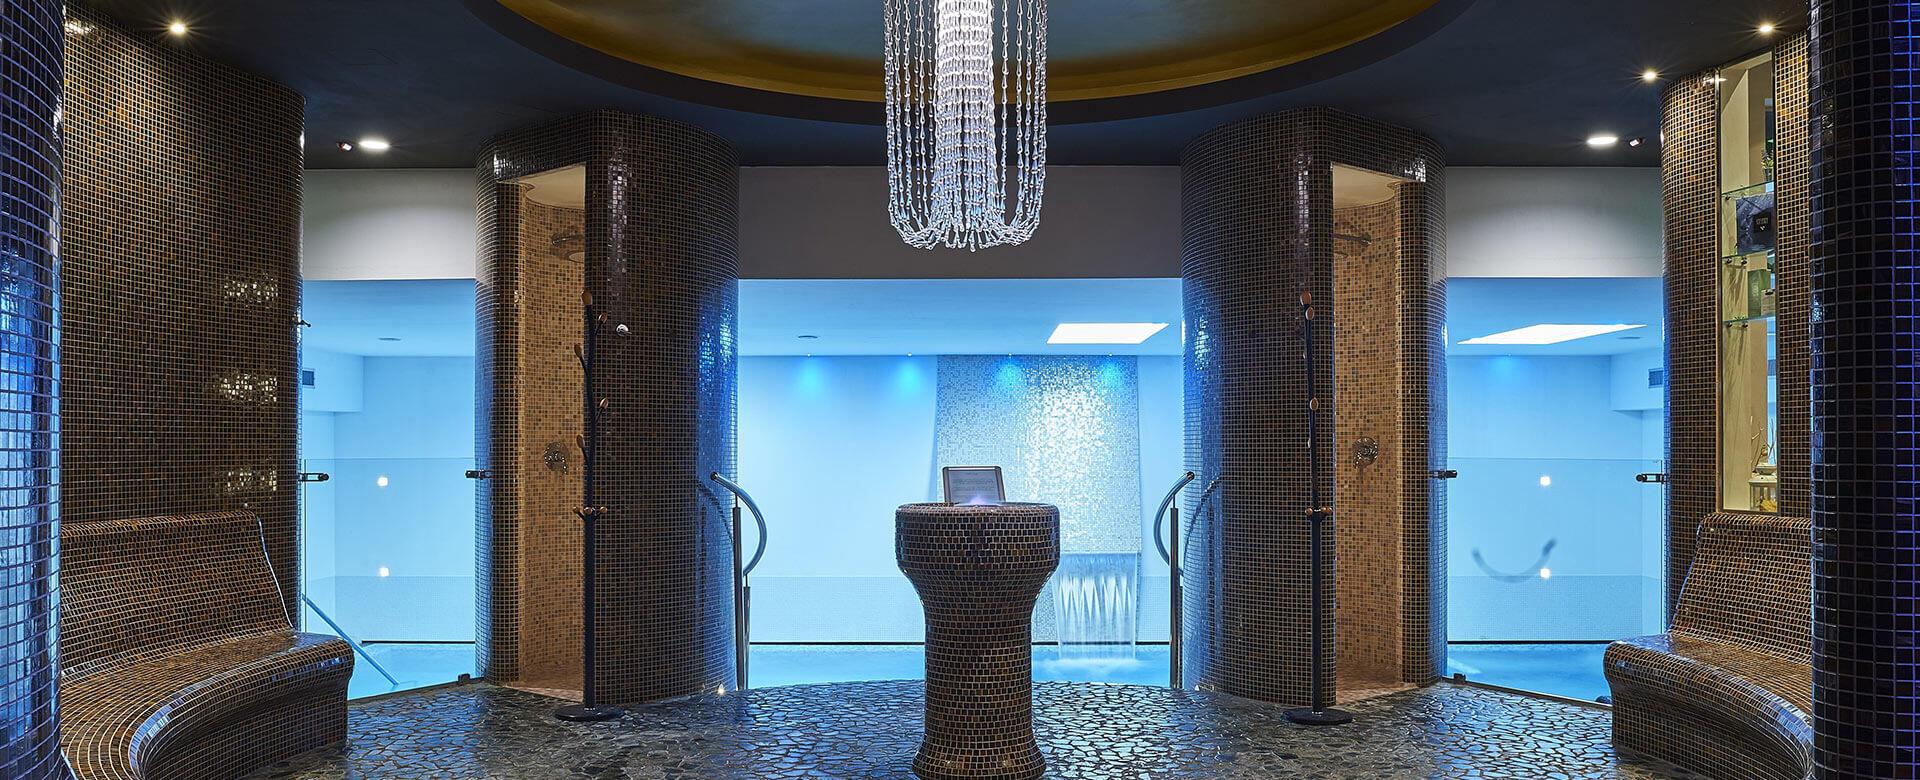 hotelvillaluisa de spa-beauty 004